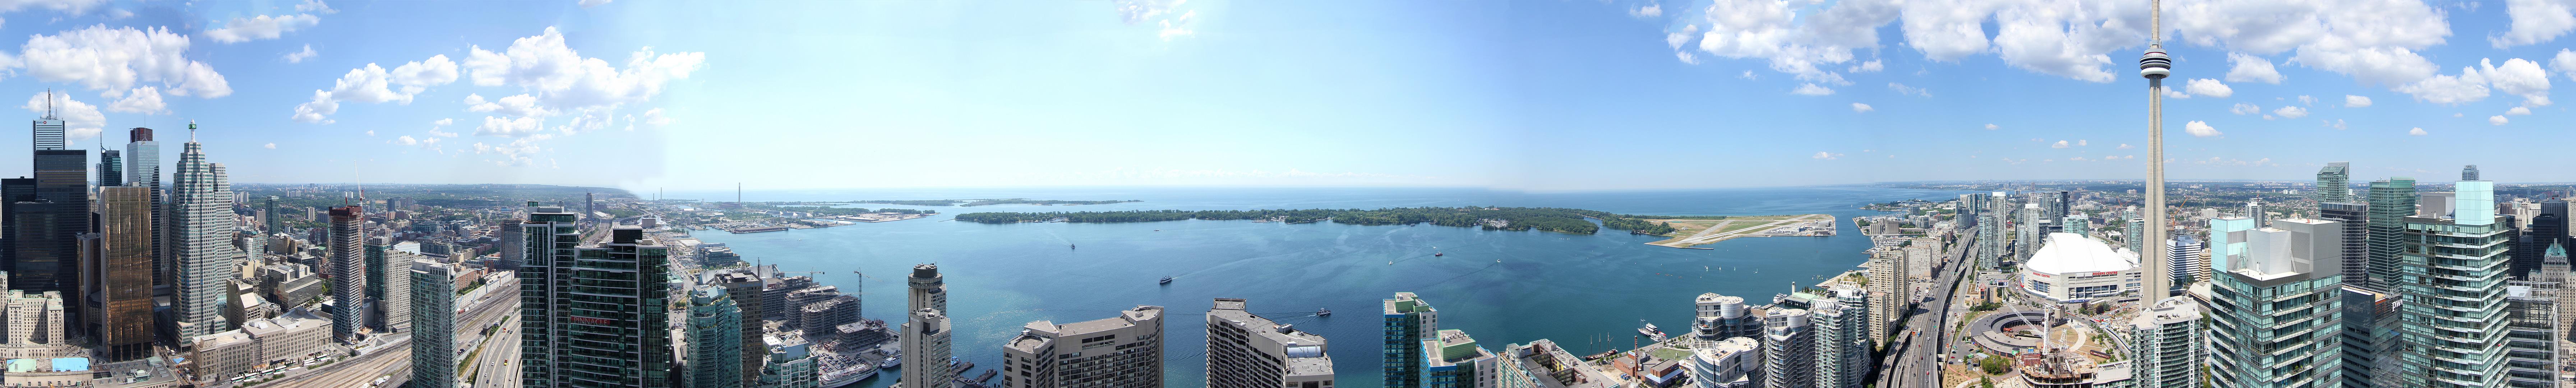 55th_floor